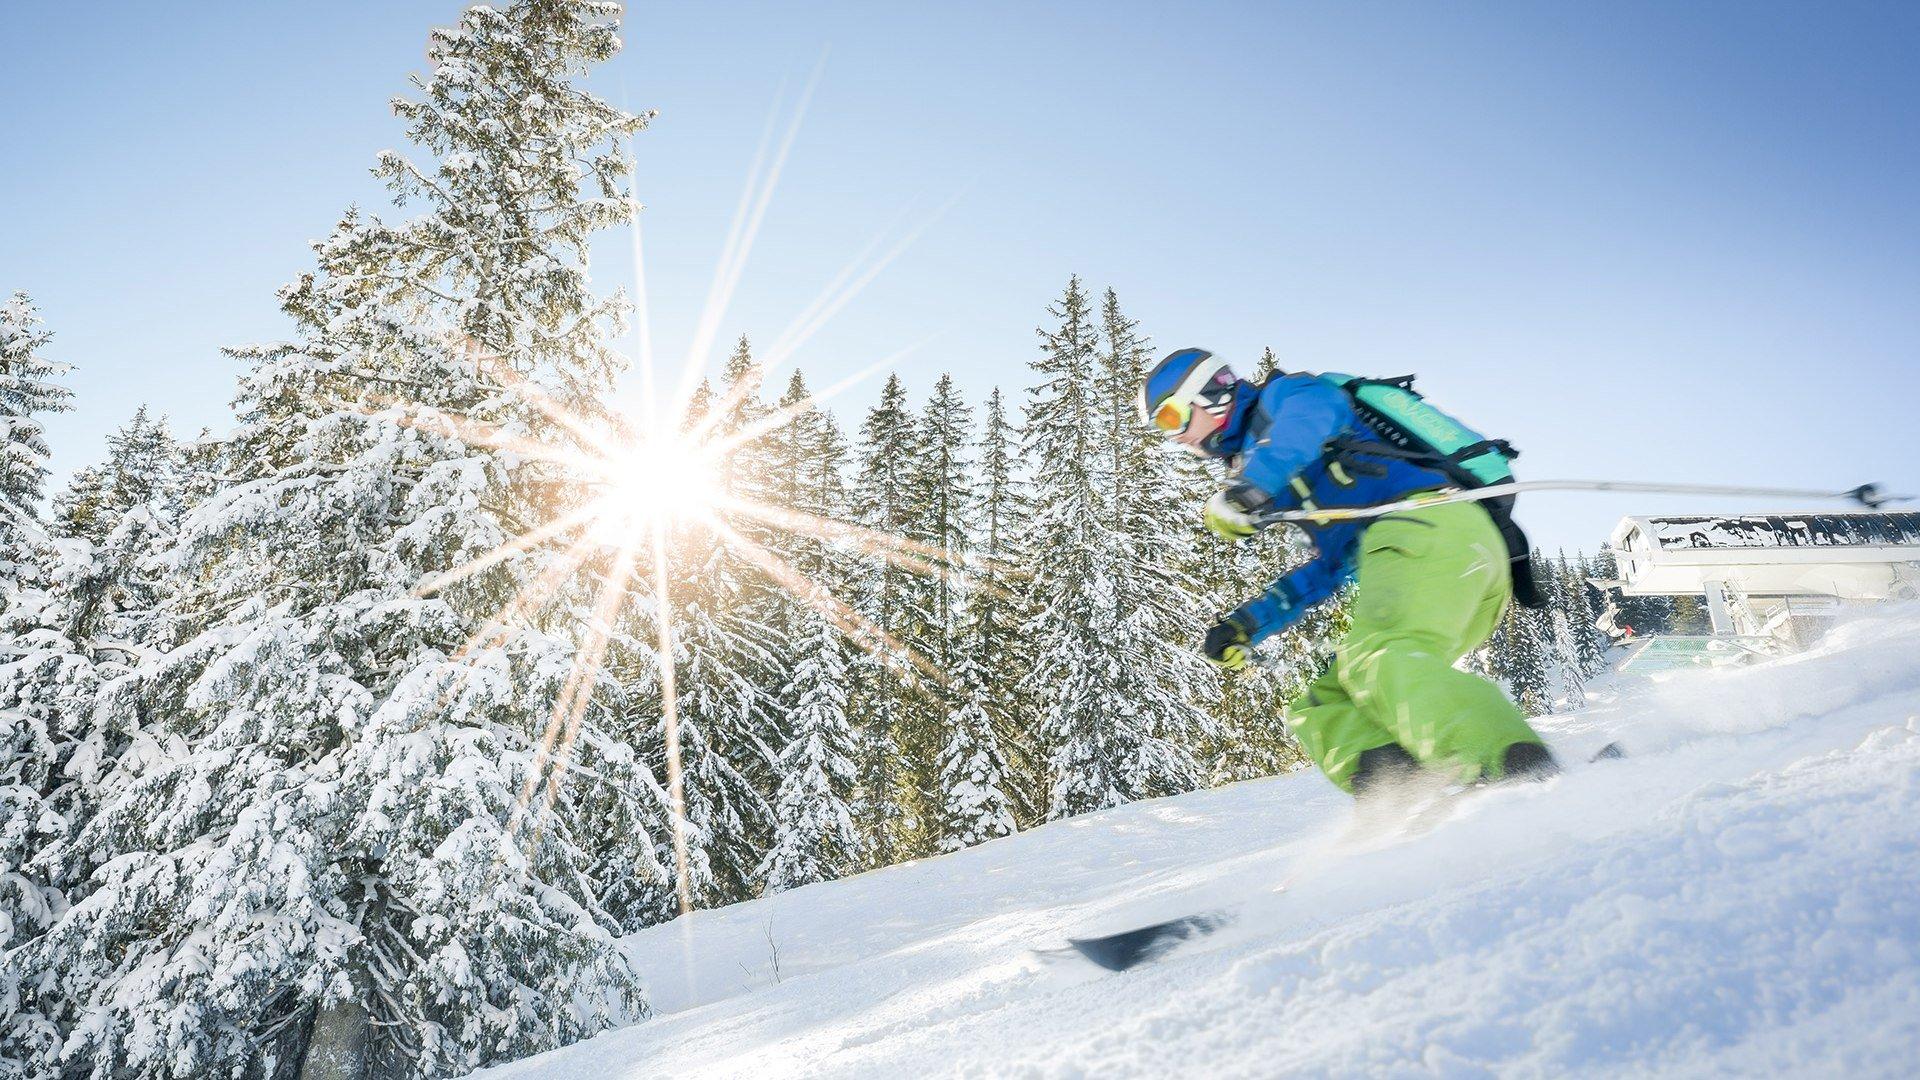 ats-wintersport-hires-57